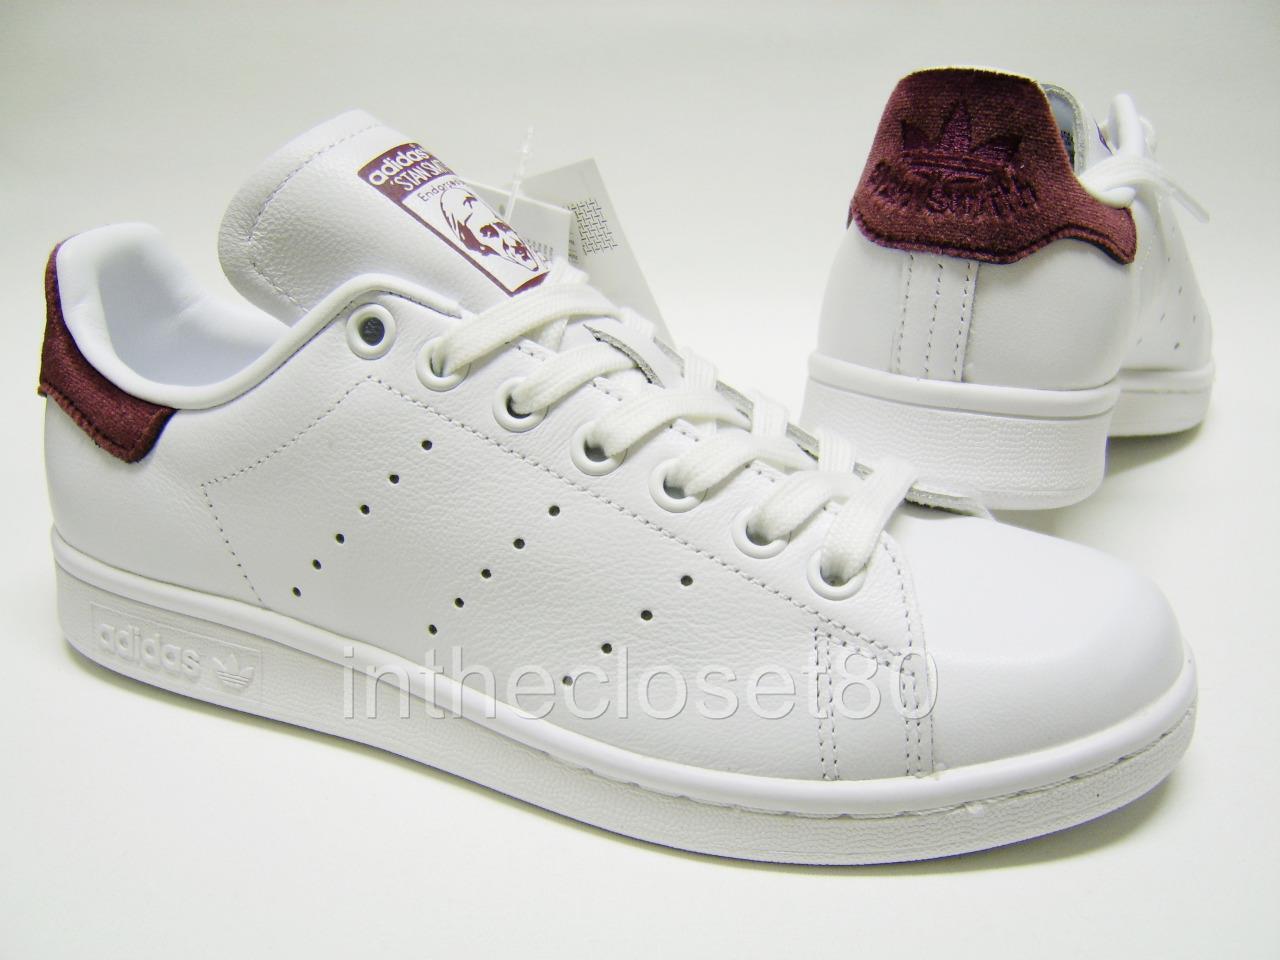 Adidas Stan Smith White Maroon Burgundy Red Velvet Womens Girls Trainers BB2867